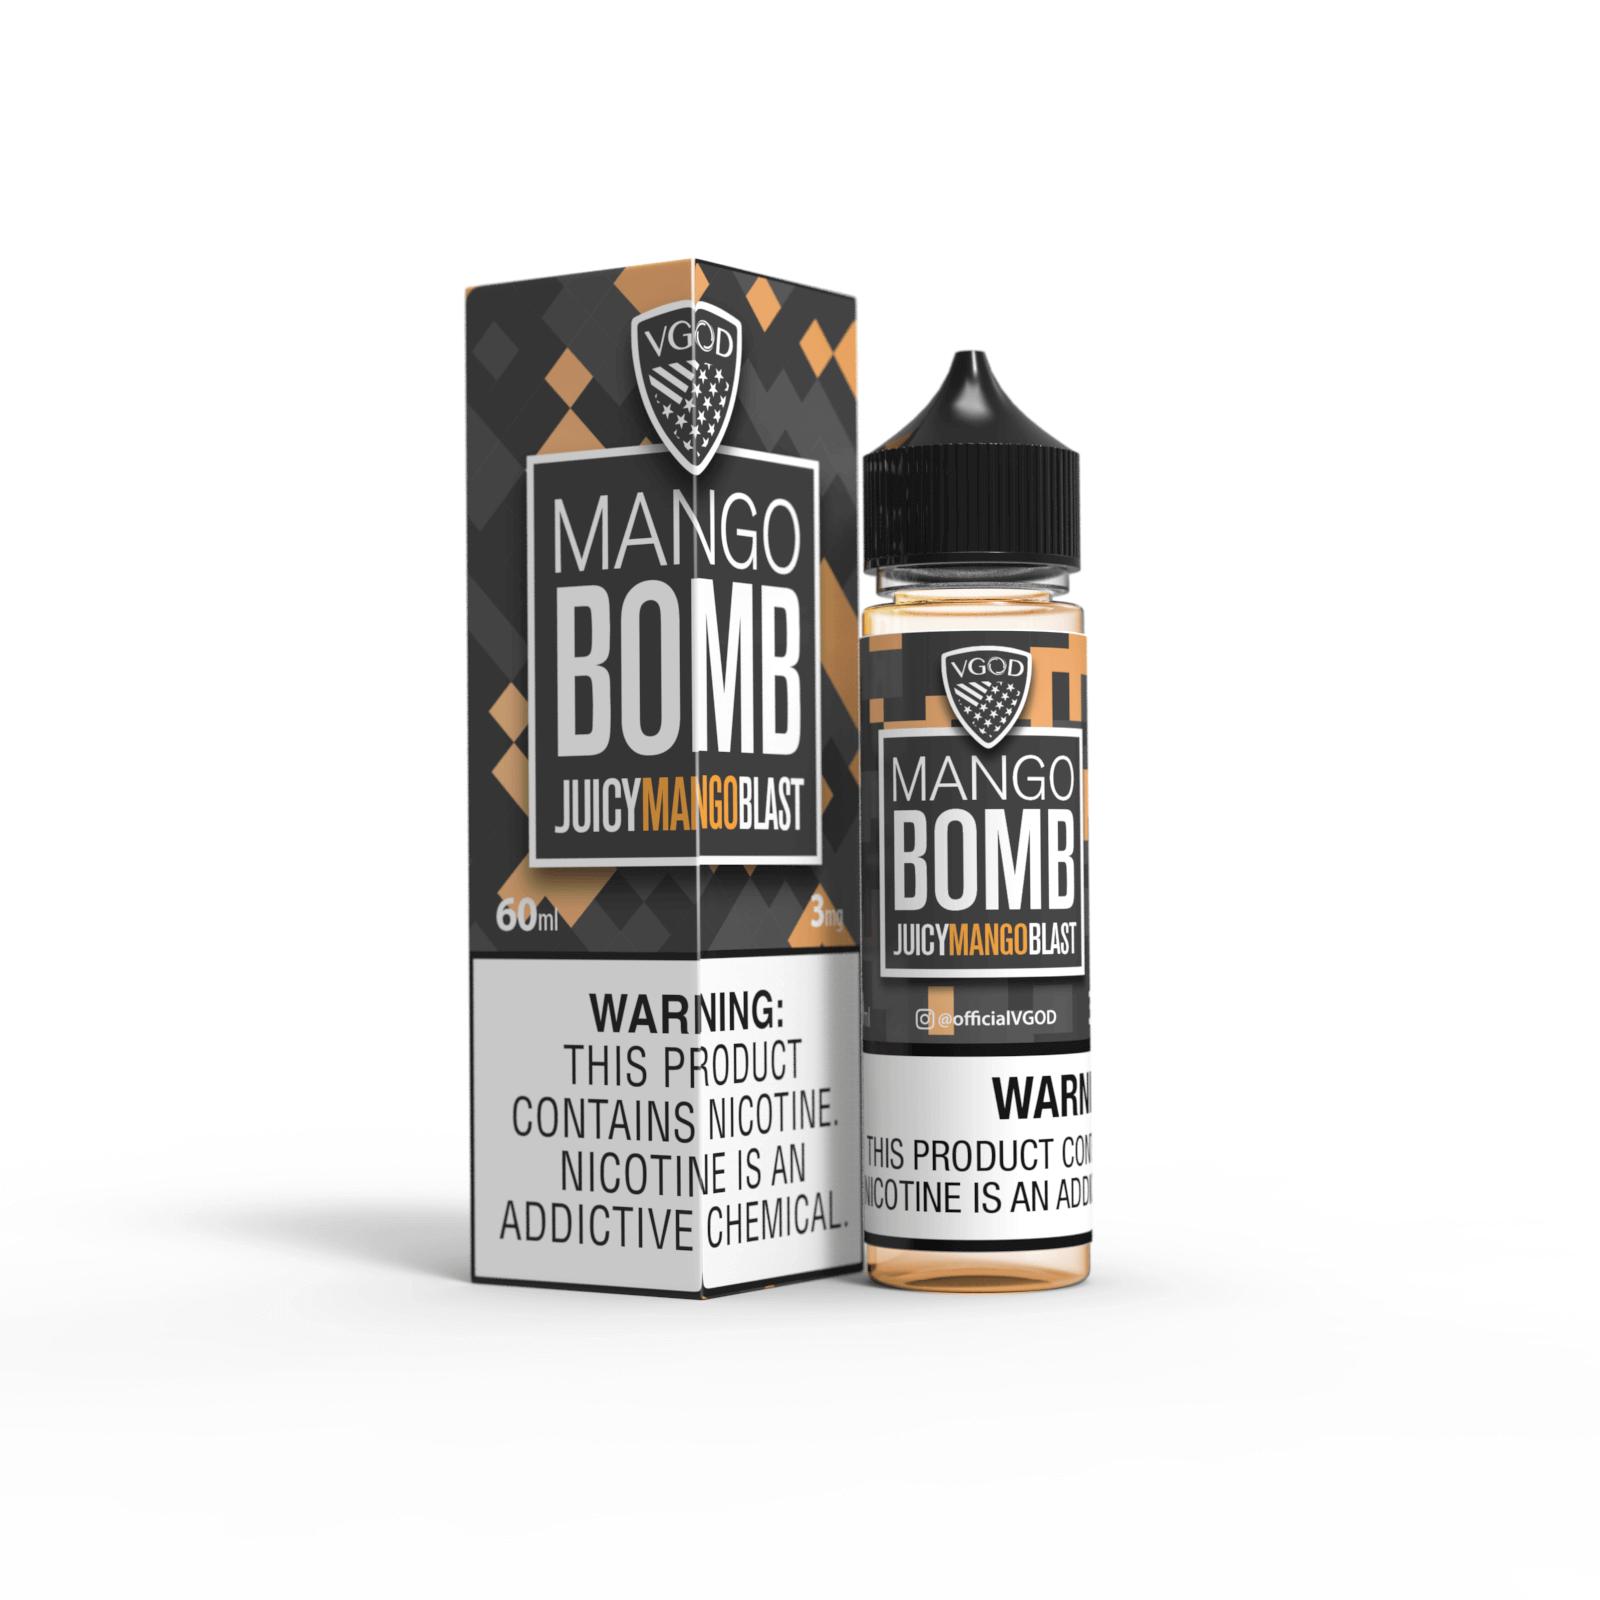 VGOD, Mango Bomb